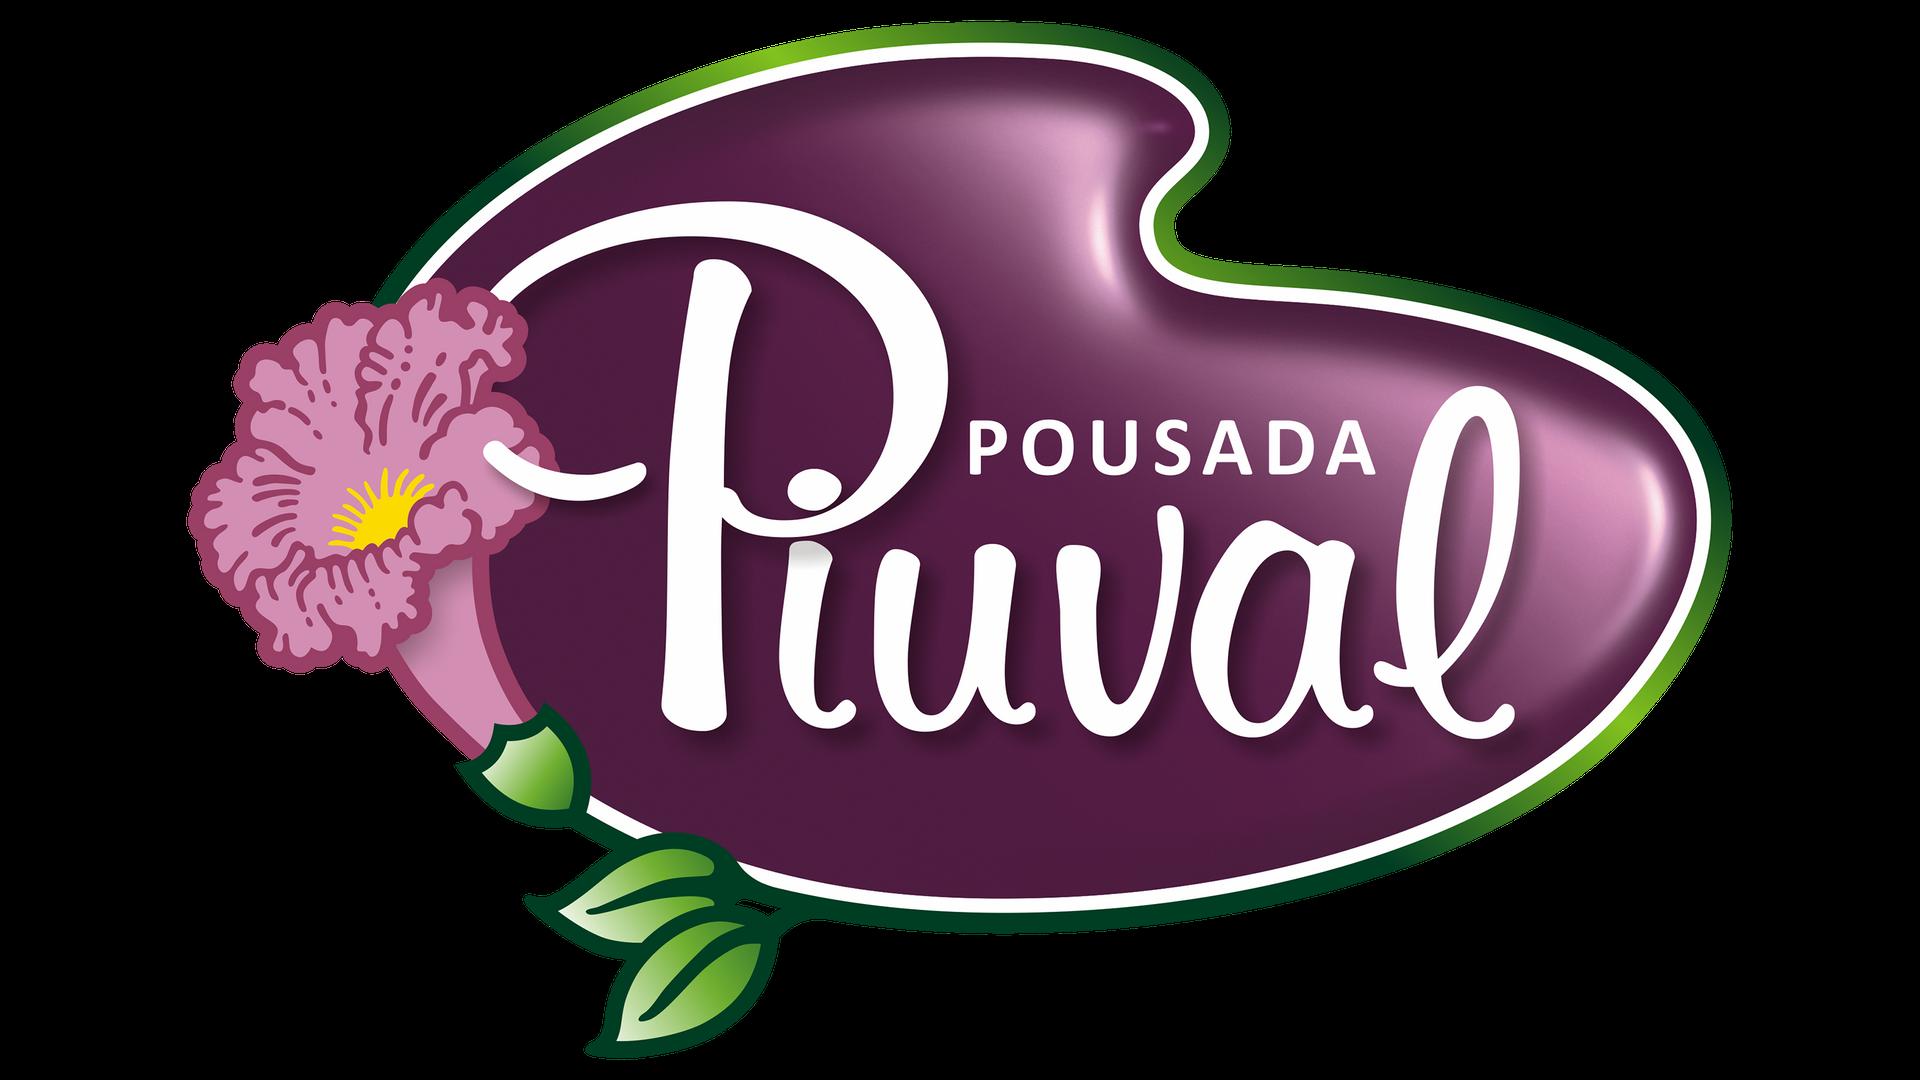 Pousada Piuval